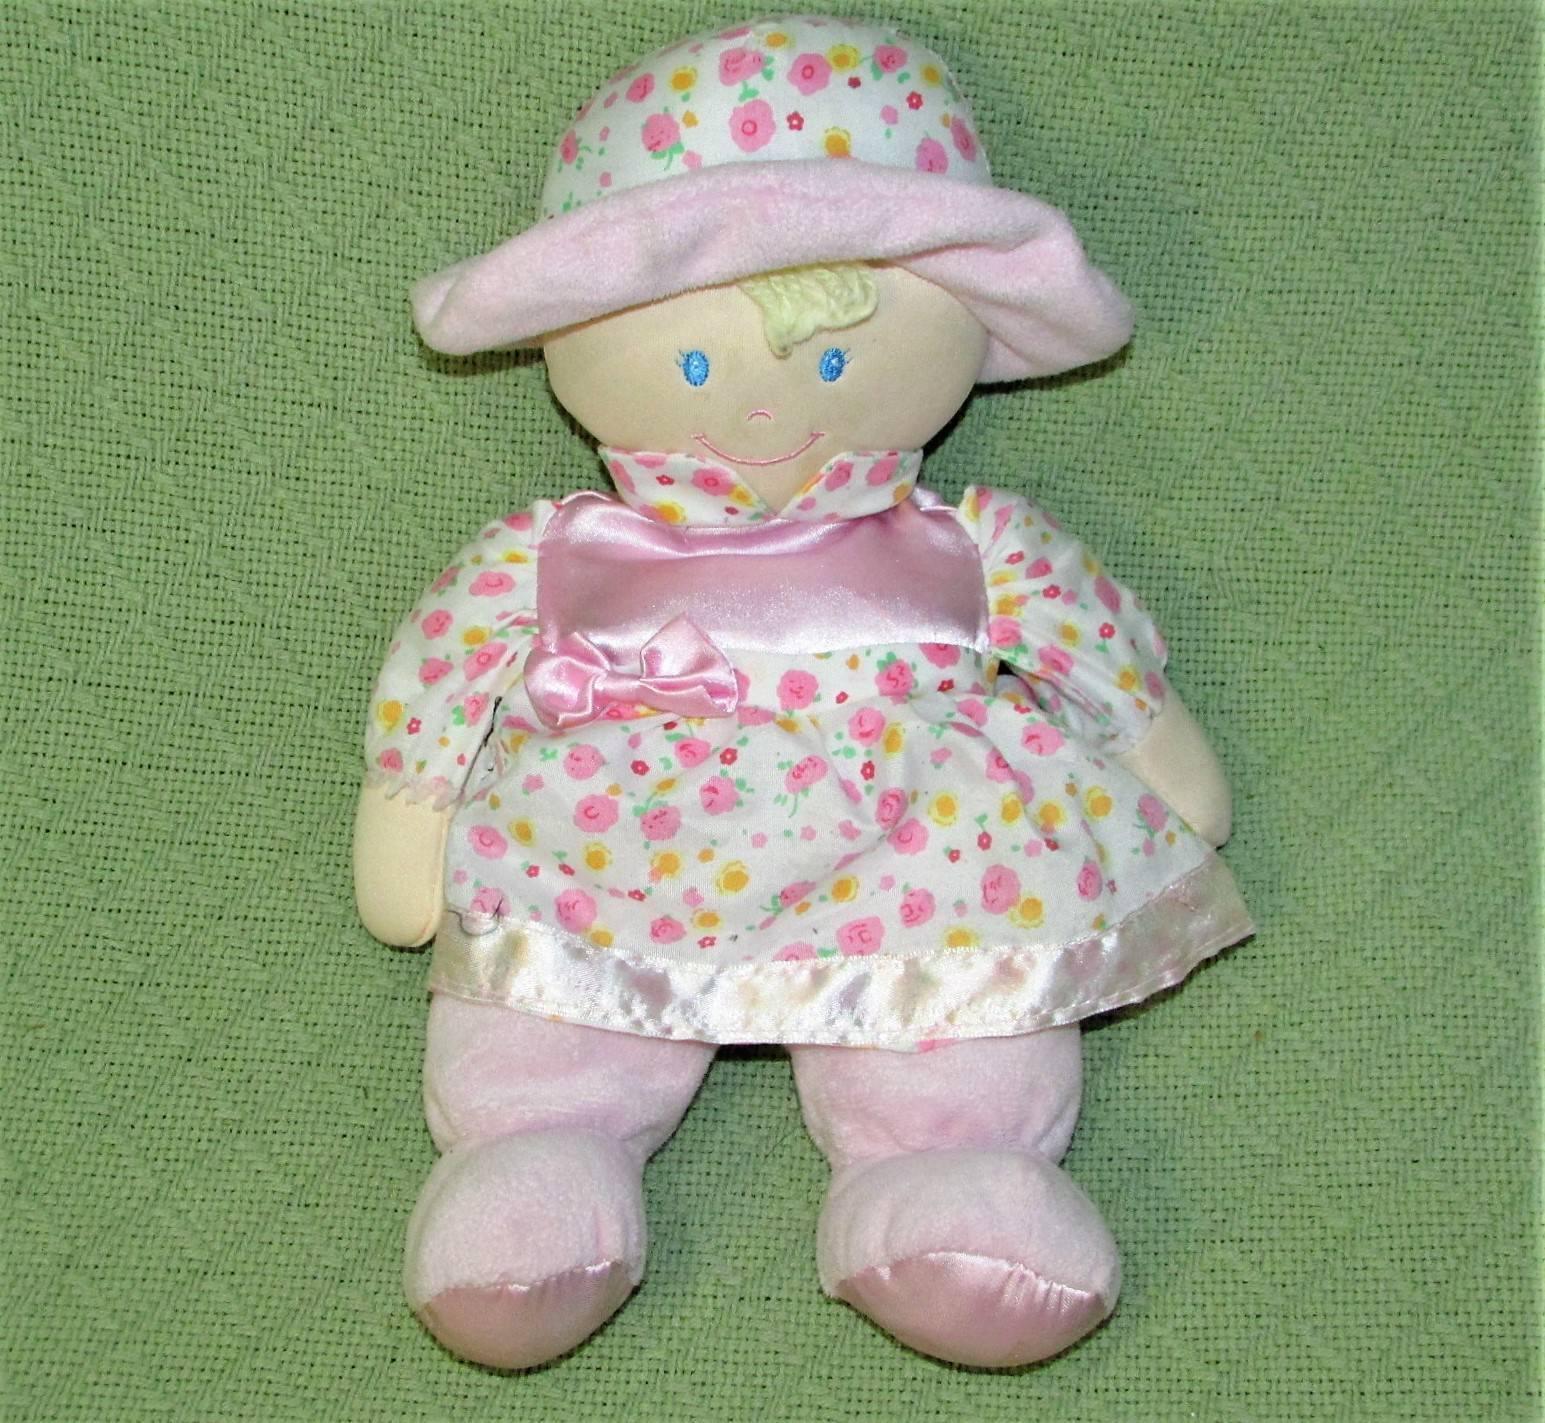 "Kids Preferred Plush BABY DOLL Pink 12"" Blue Eyes Satiny Flower Dress Hat 2012"